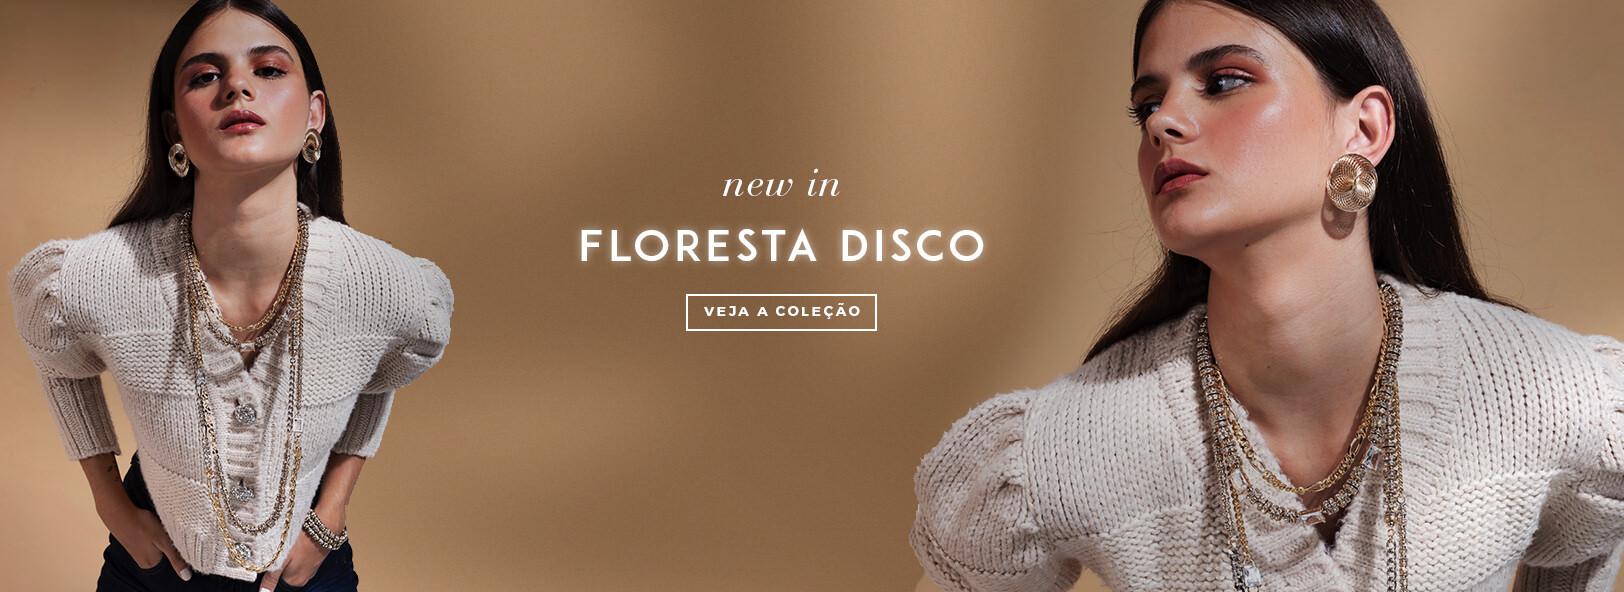 Floresta Disco